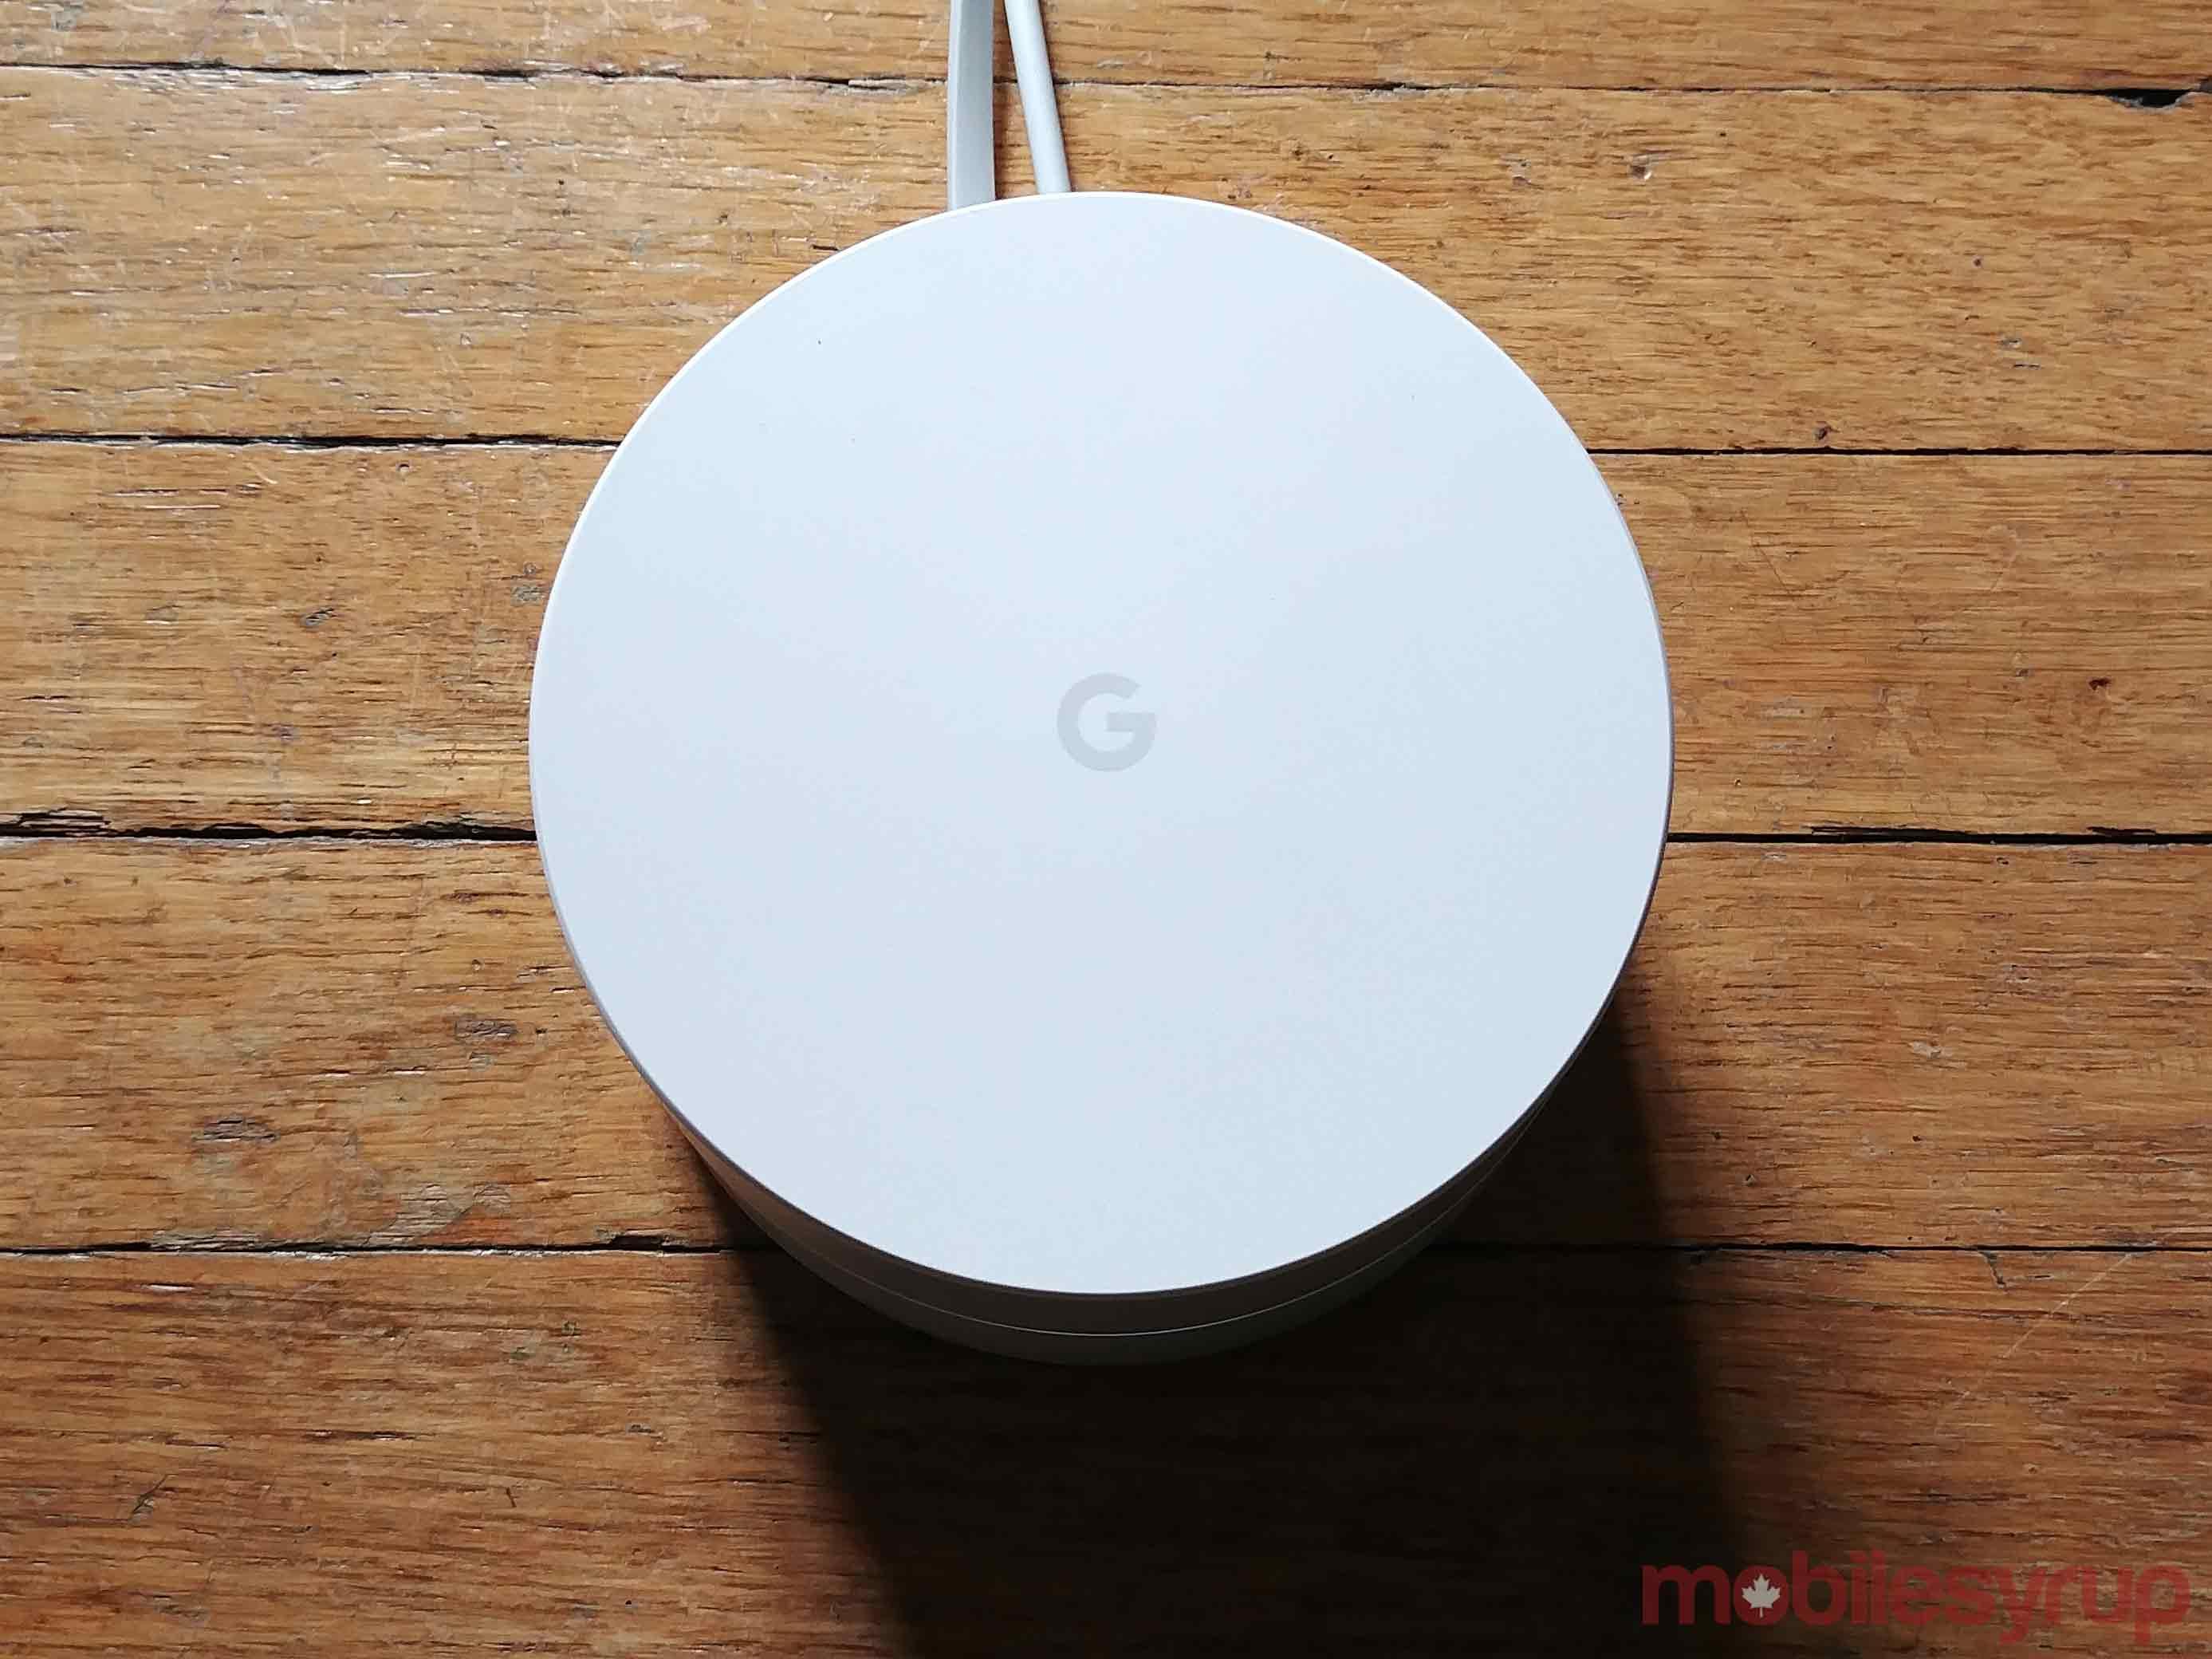 Google wifi on floor